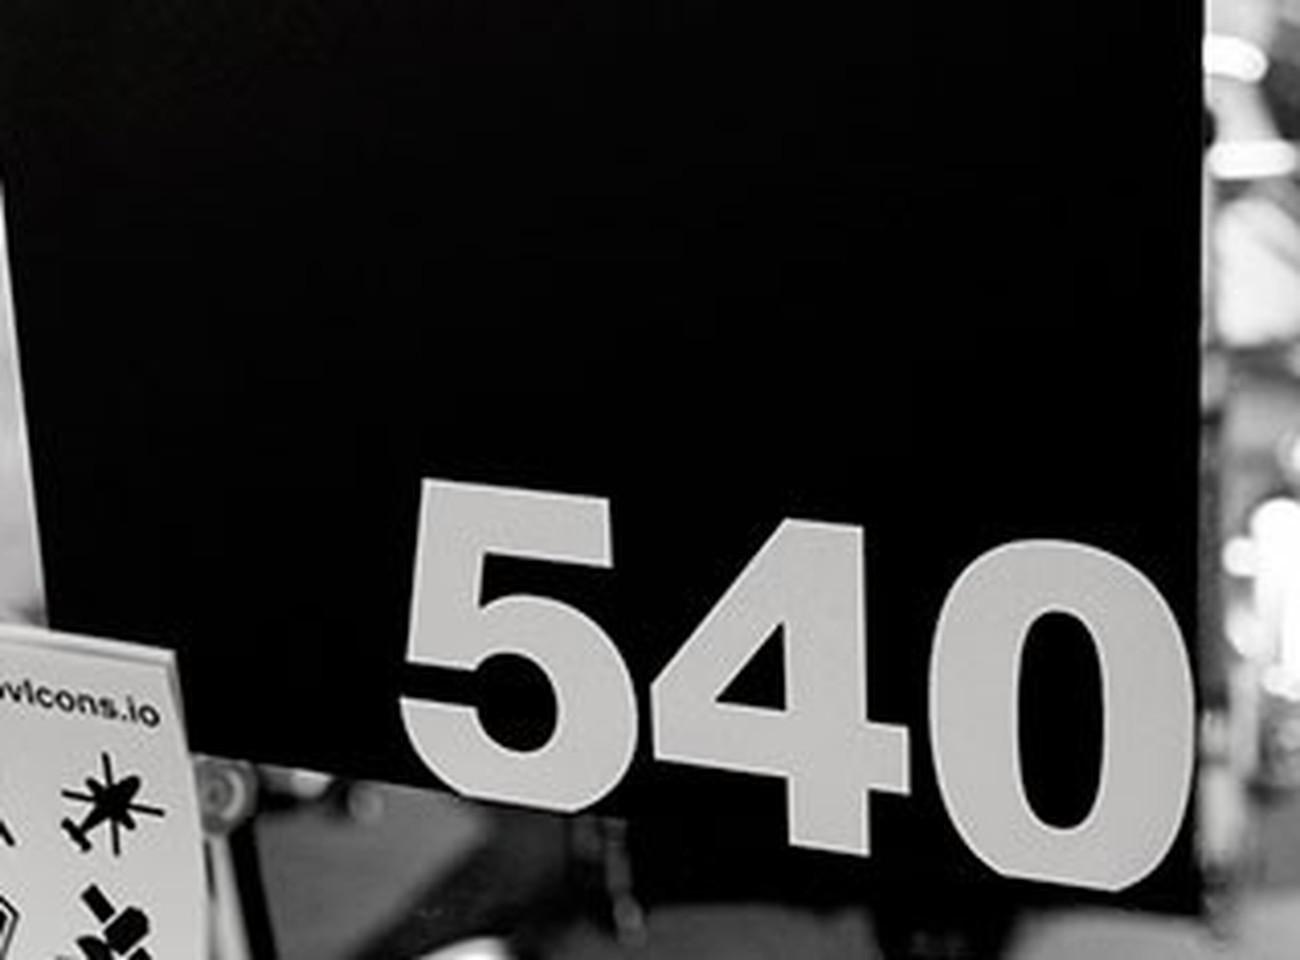 540 Careers